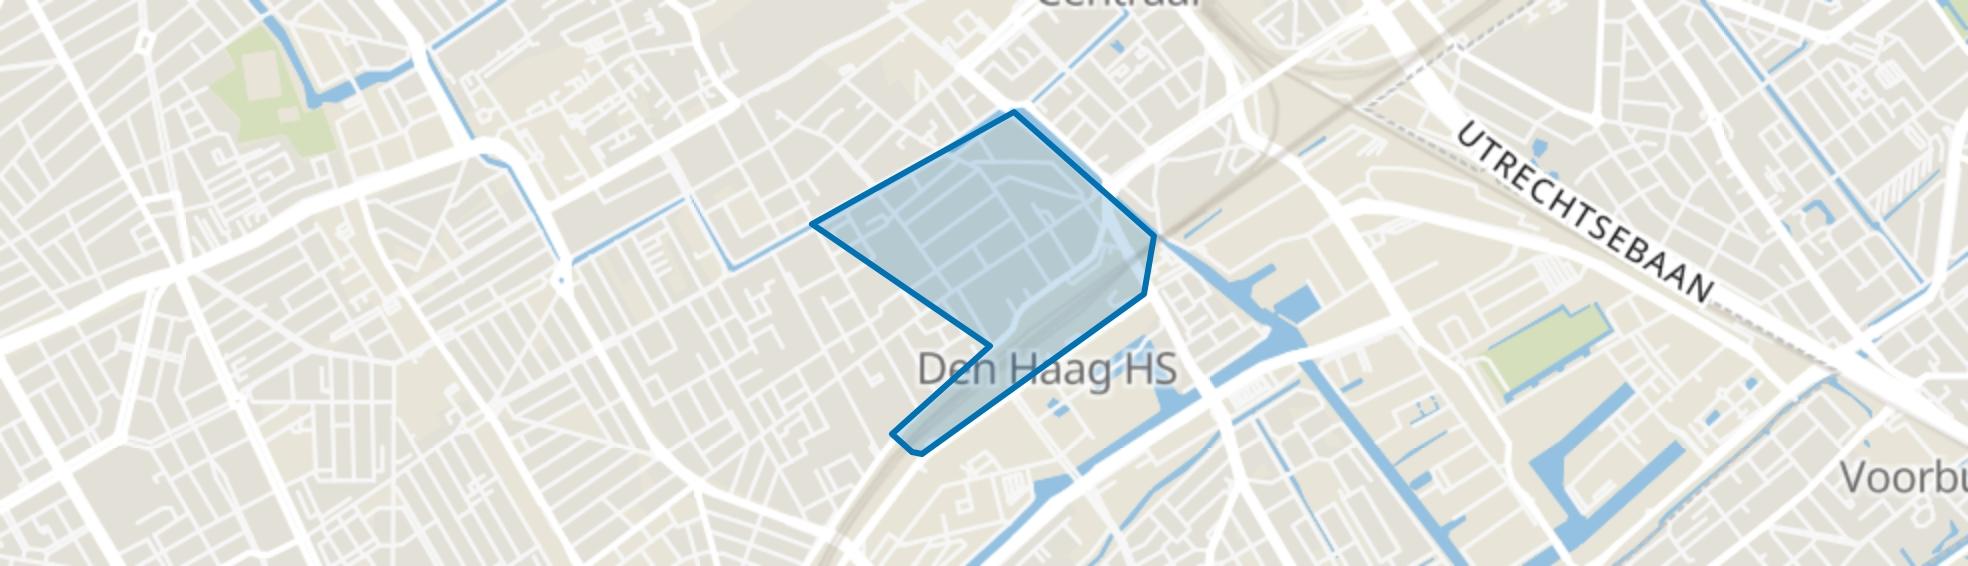 Huygenspark, Den Haag map